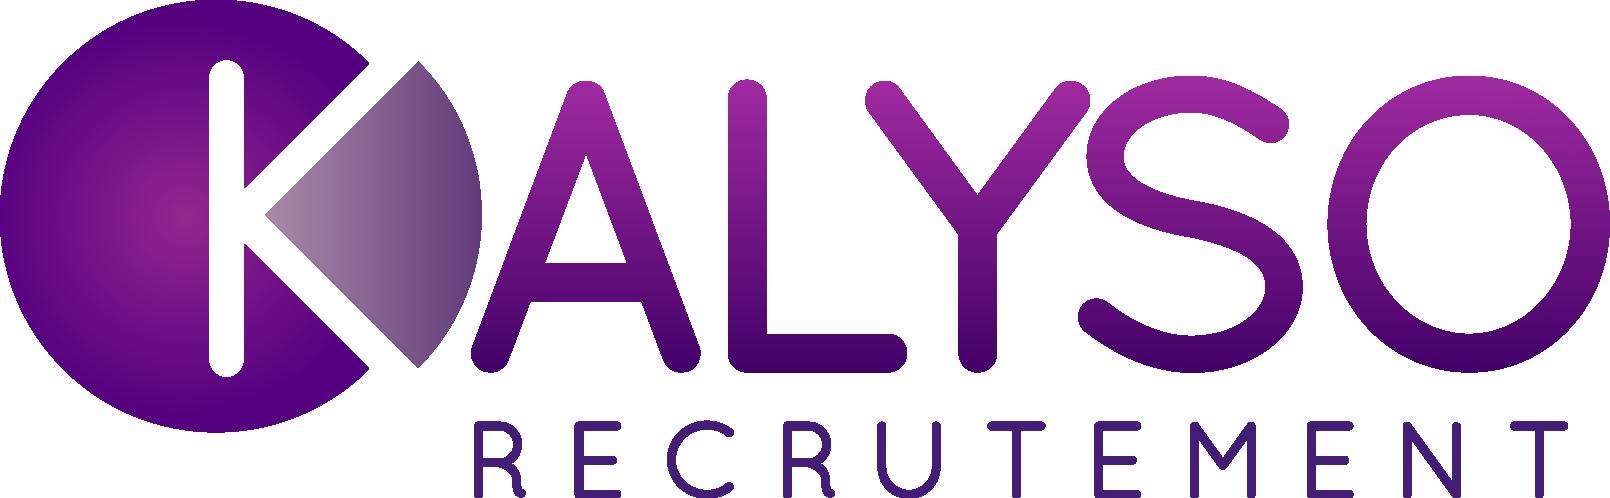 Kalyso-Recrutement